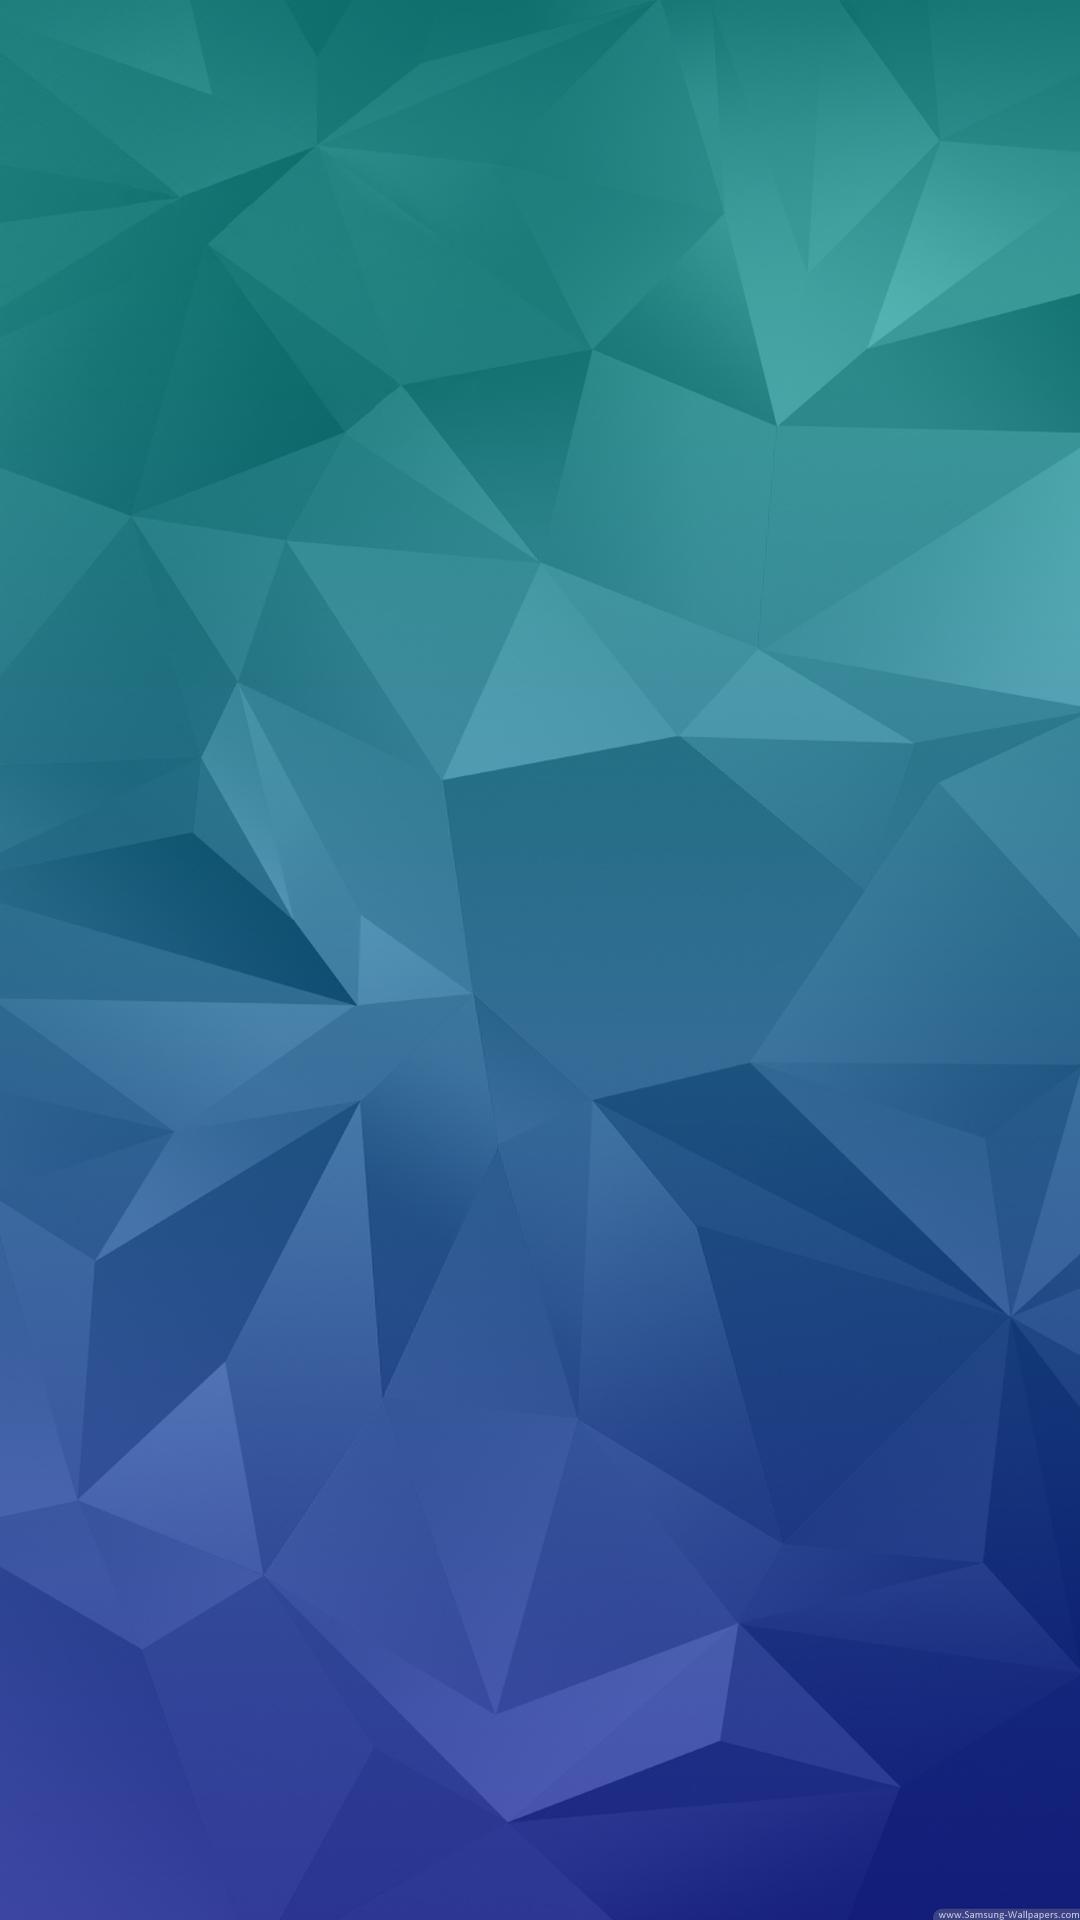 Galaxy S5 Wallpaper - Samsung Wallpapers